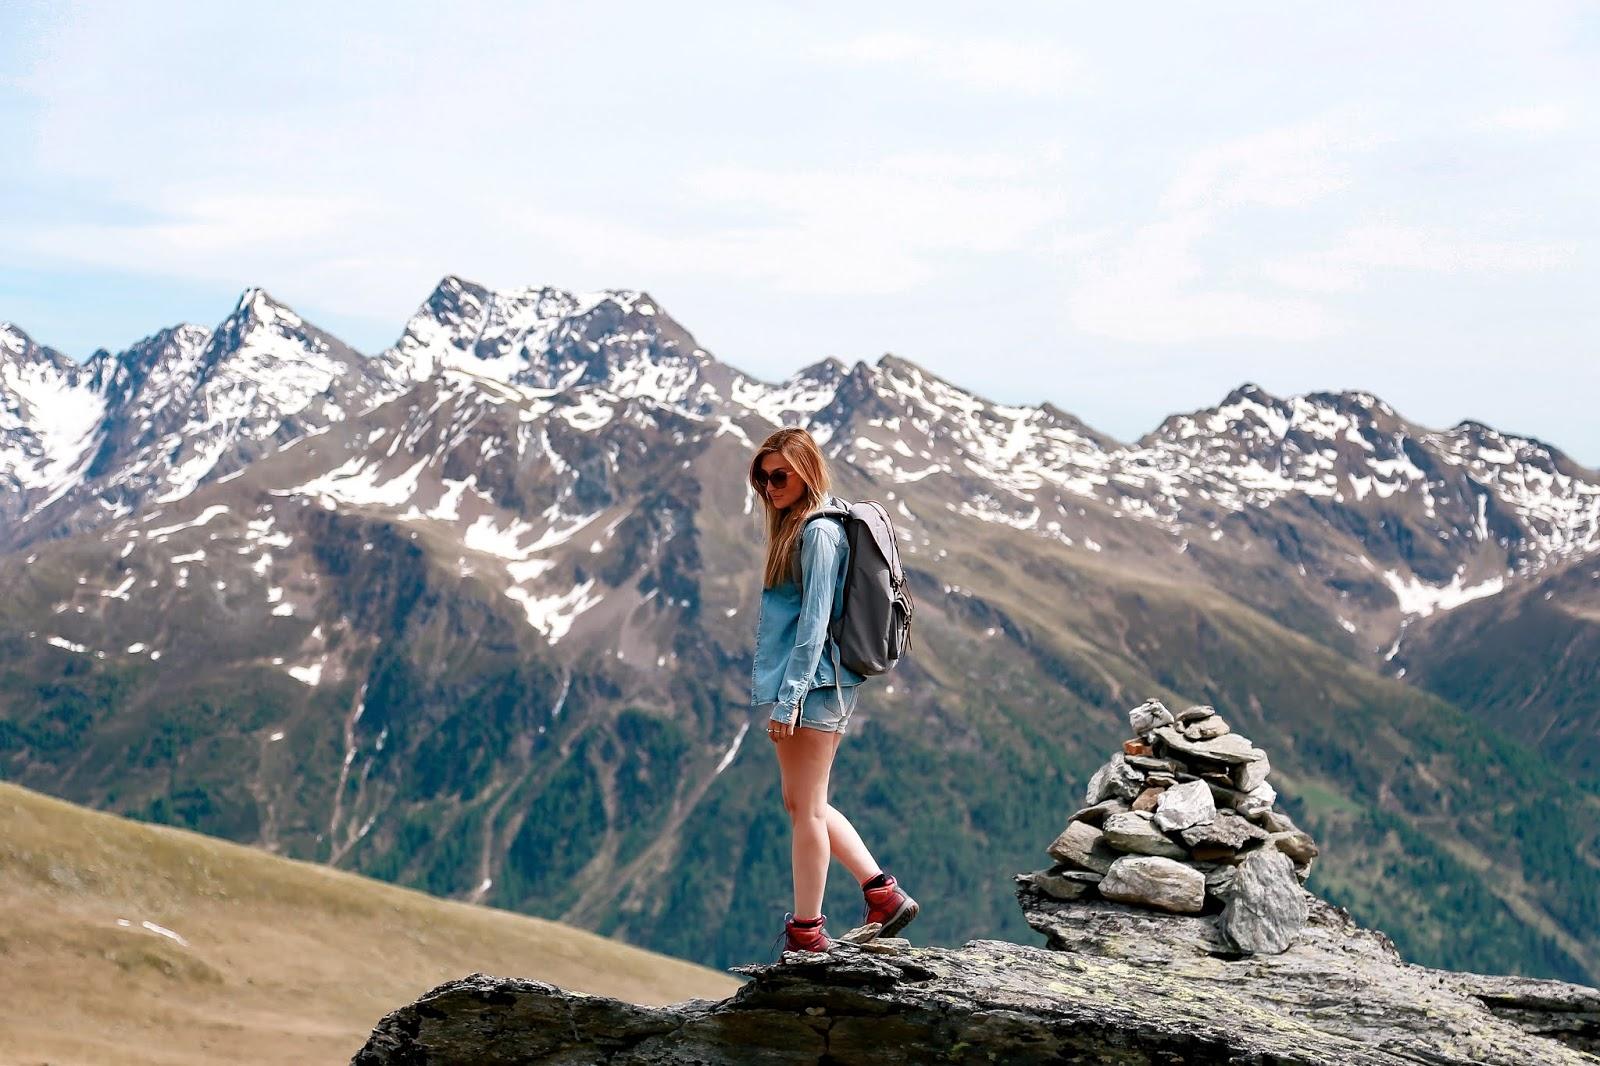 Outdoorbligger-fashionstylebyjohanna-Bayern-wandern-in-österreich- wandern-in-bayern-outdoorblogger